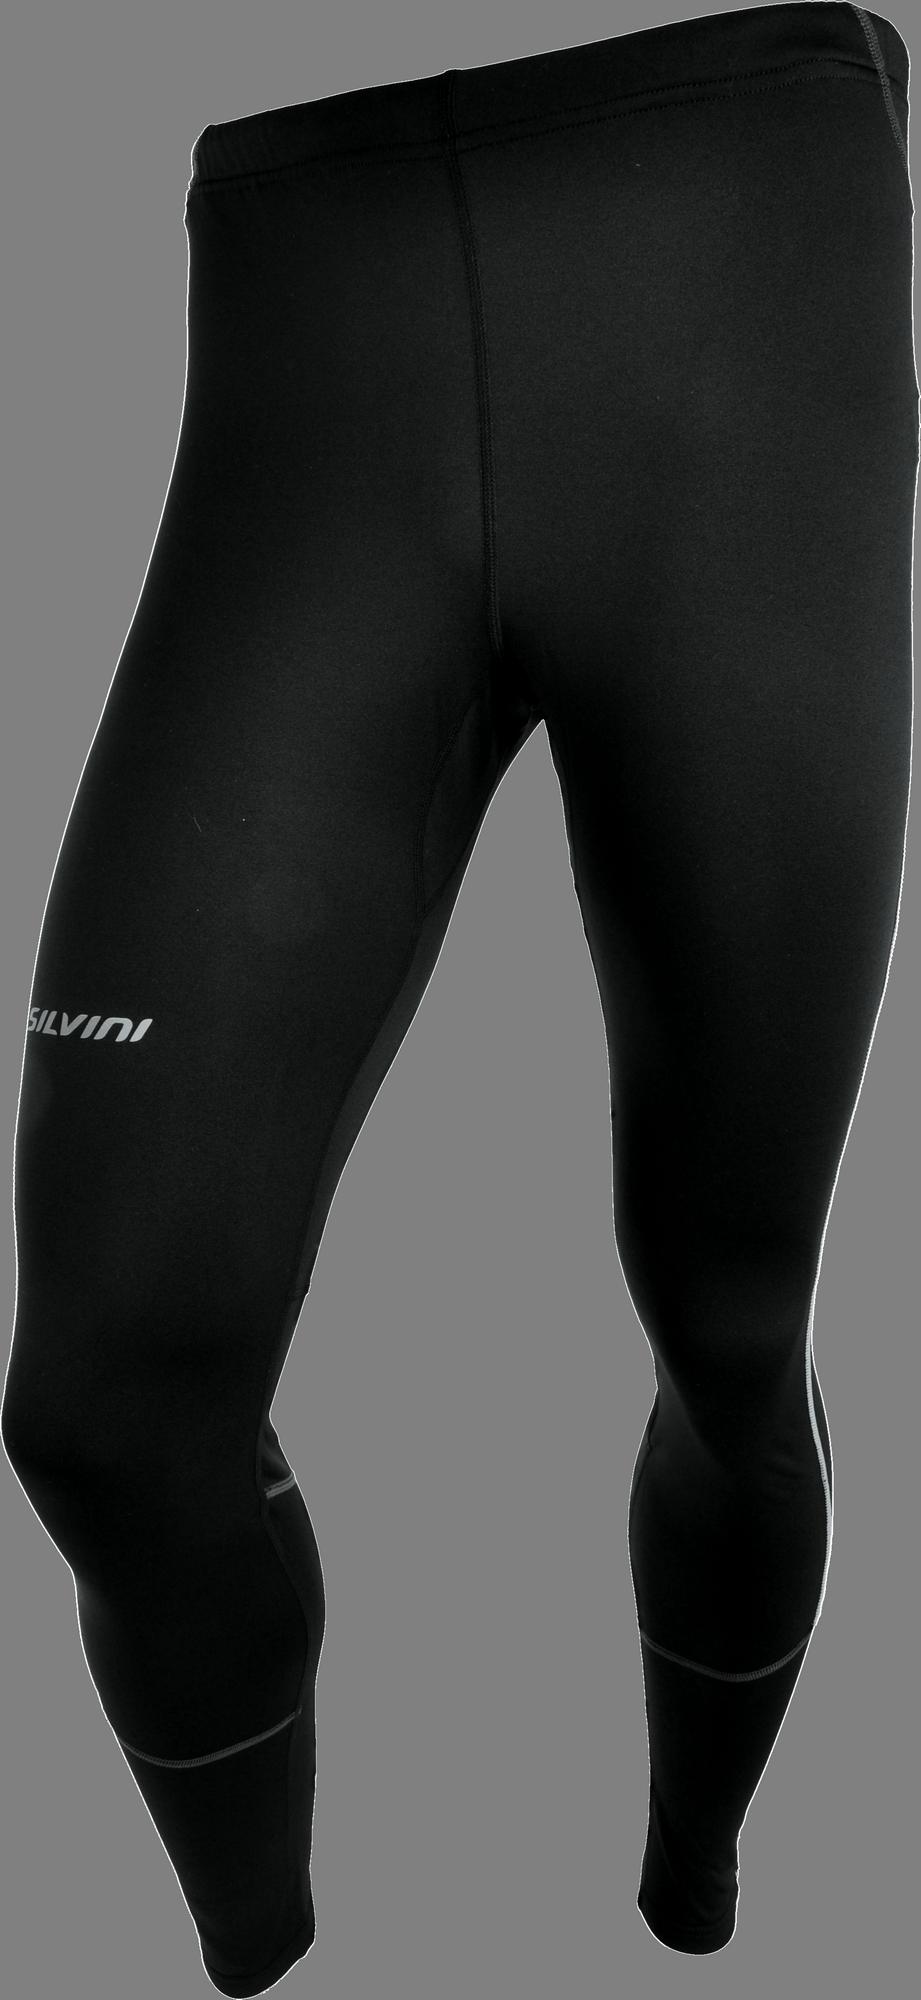 fe255d54d8ec Silvini Rubenza MP1116 pánske elastické nohavice black